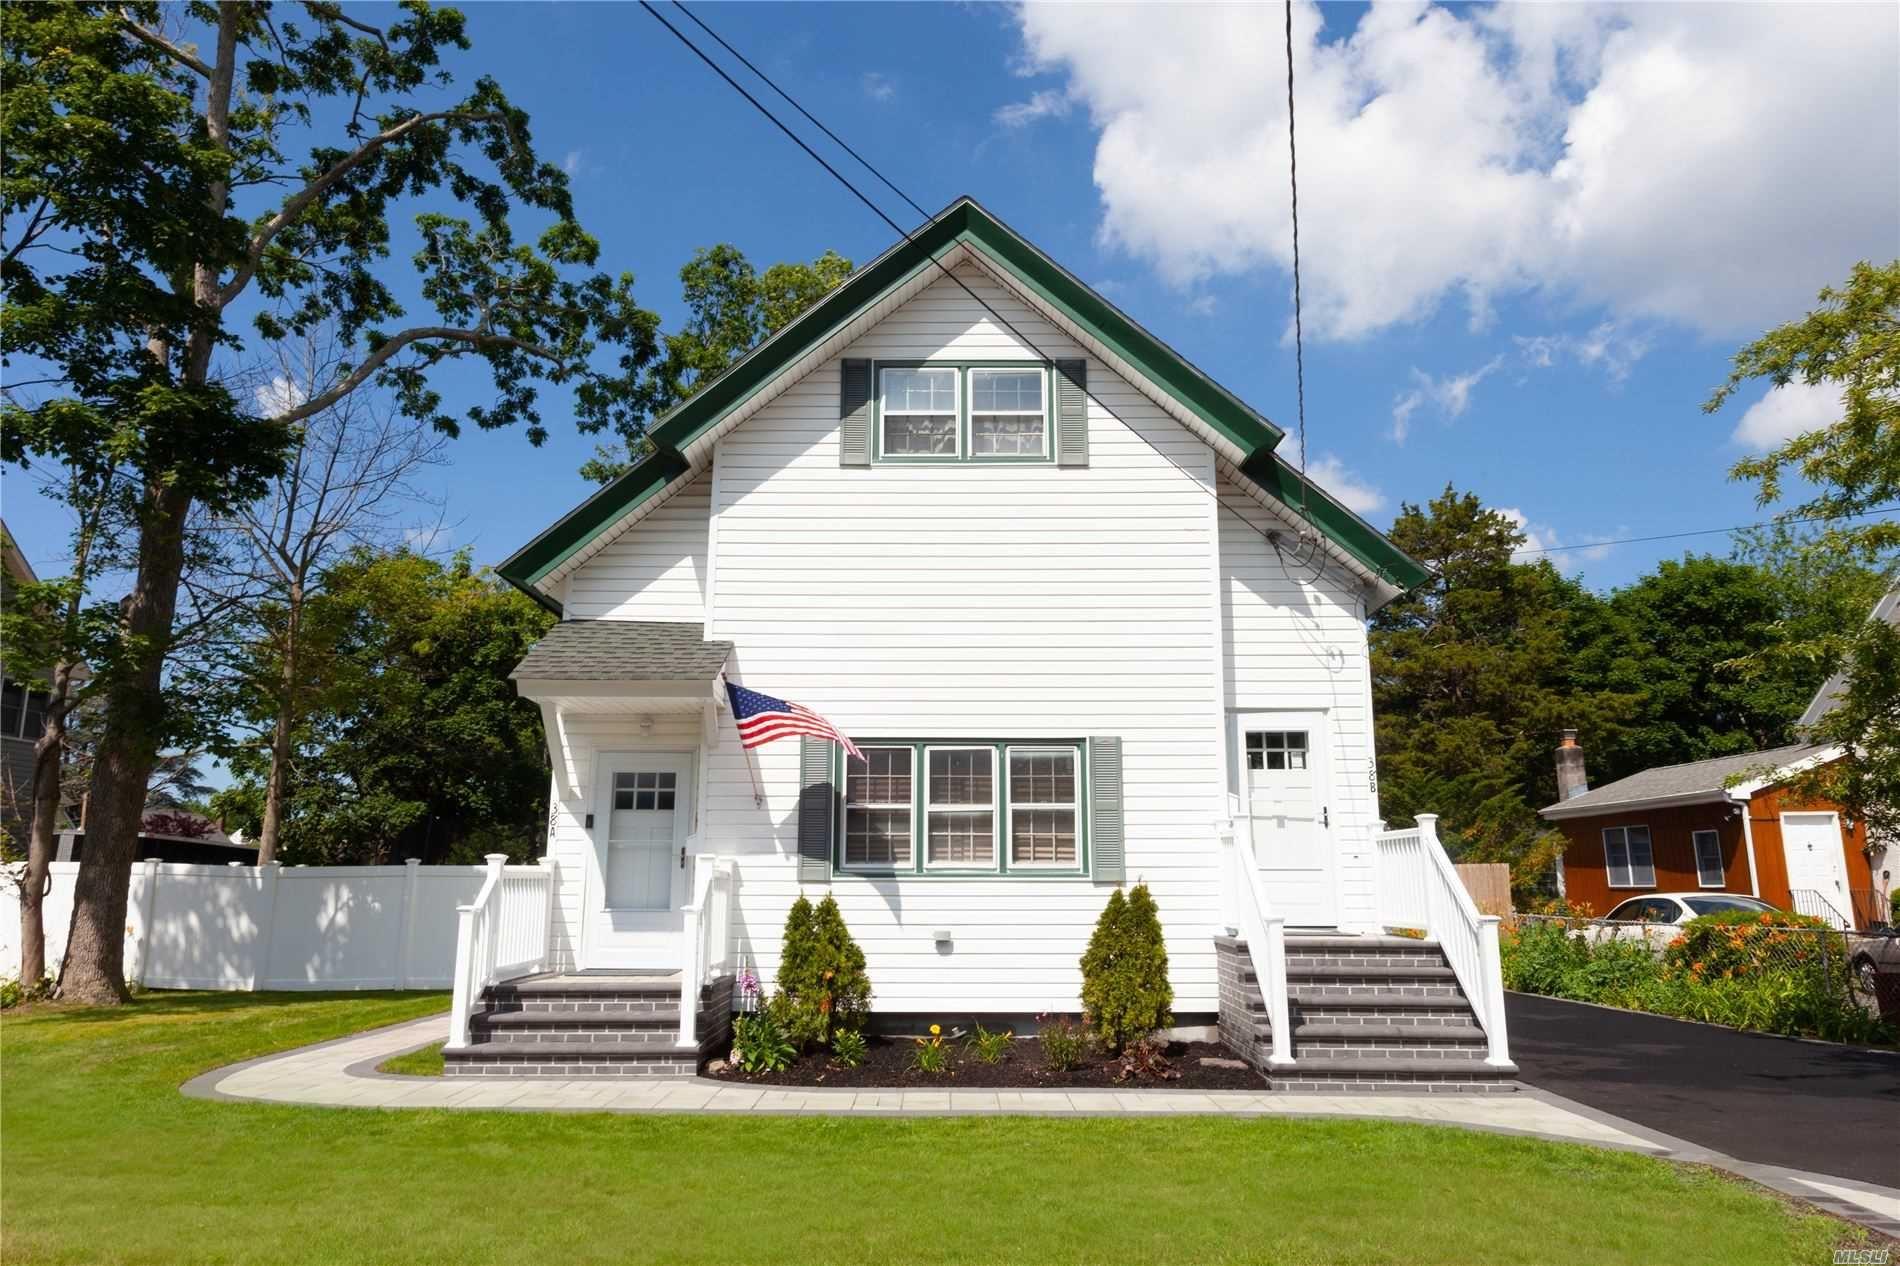 38 Laurel Avenue, East Islip, NY 11730 - MLS#: 3226015